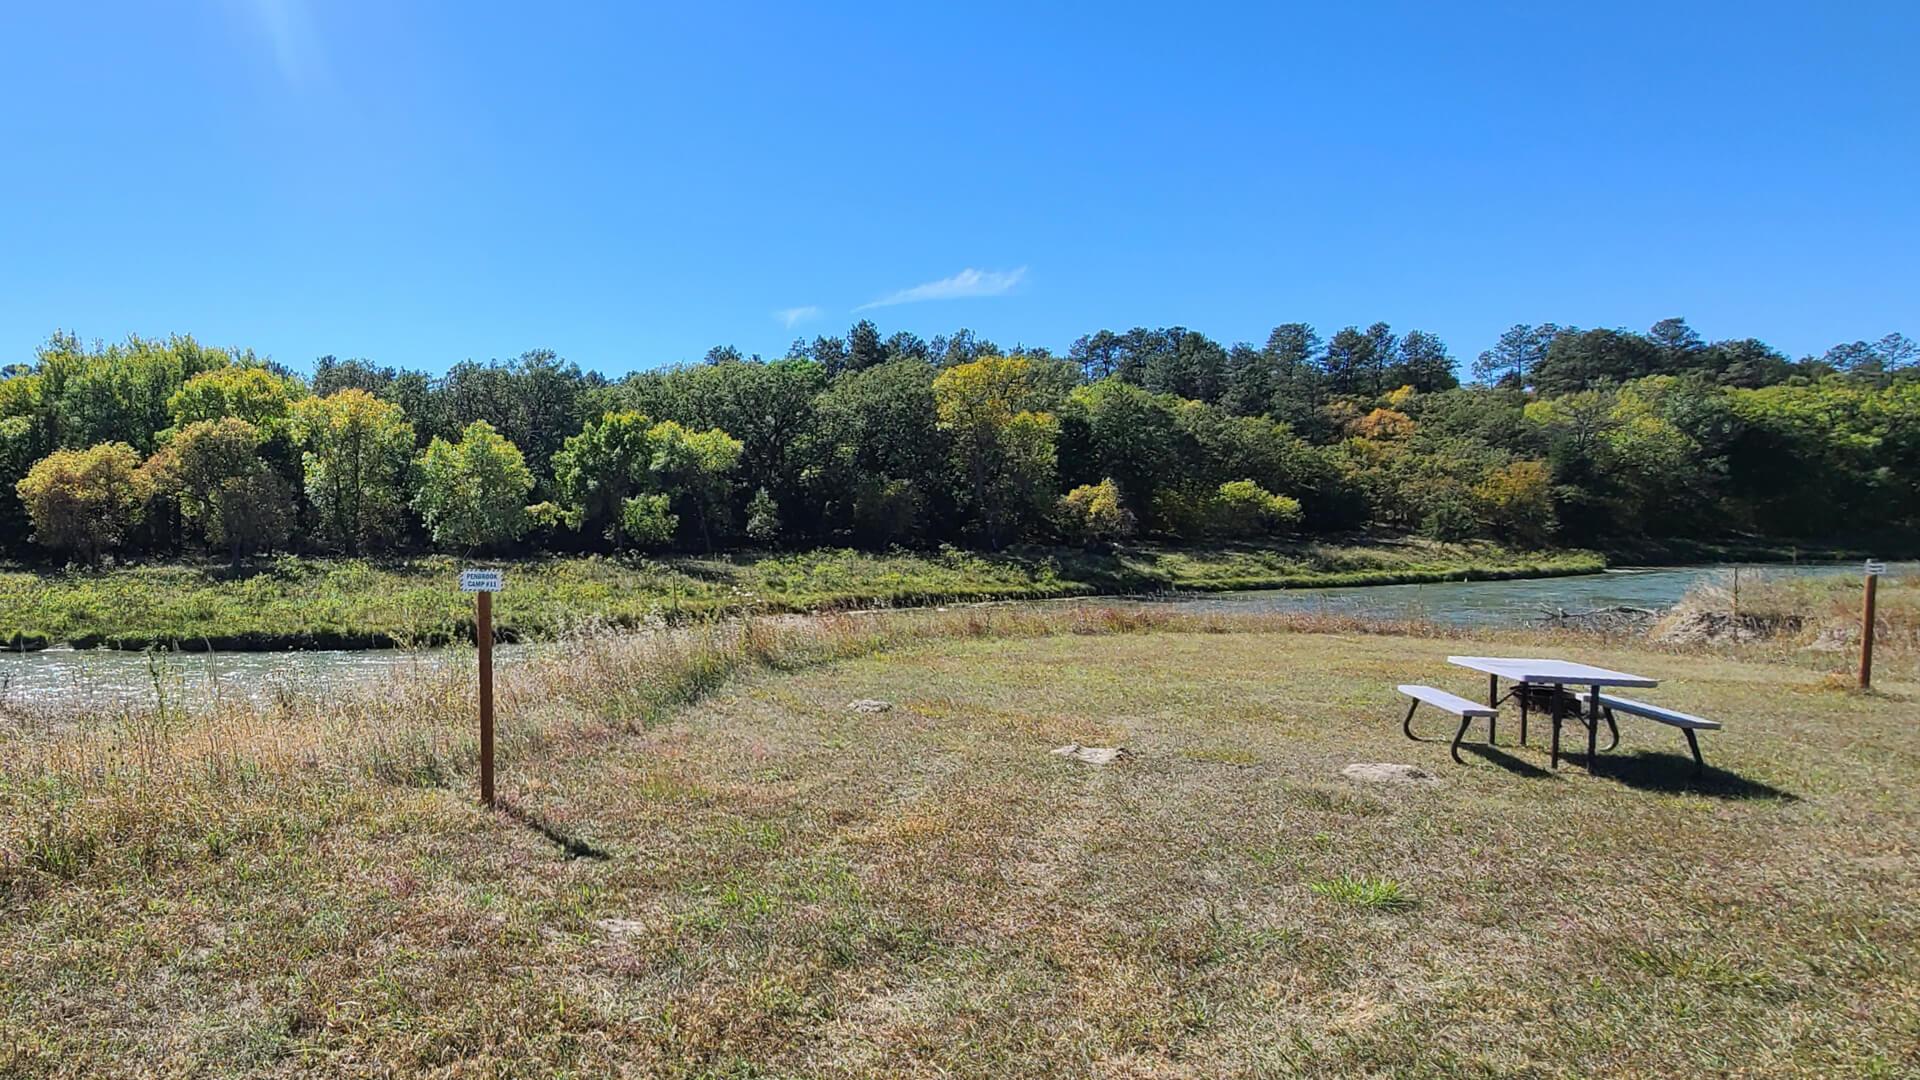 Open Camp Spot near the Niobrara River